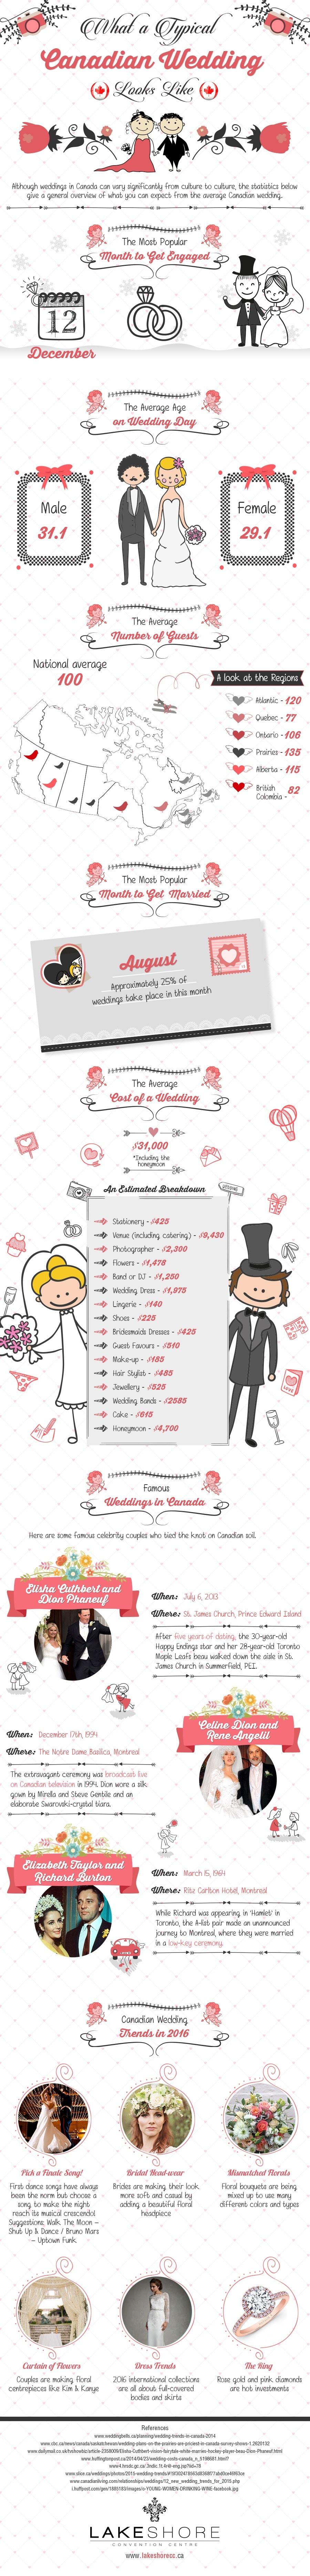 Making Your Wedding Unique 2